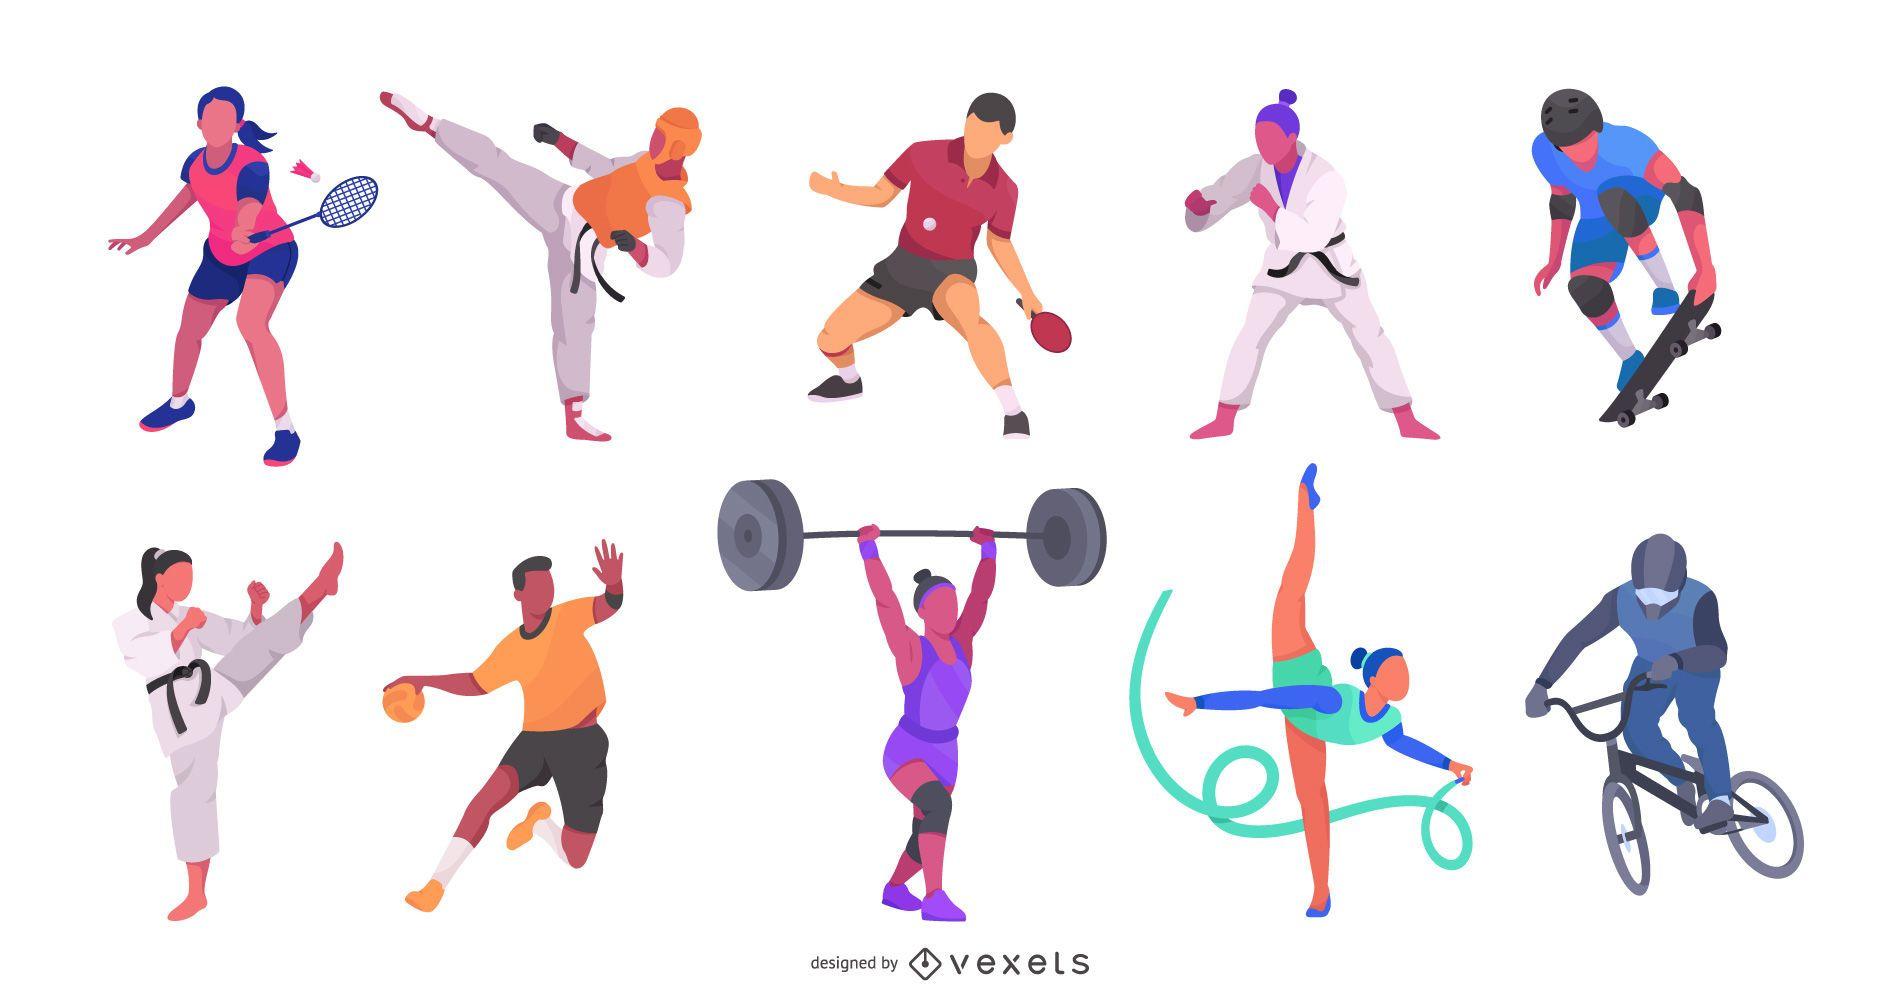 Olympic Athletes Fiat Illustration Pack